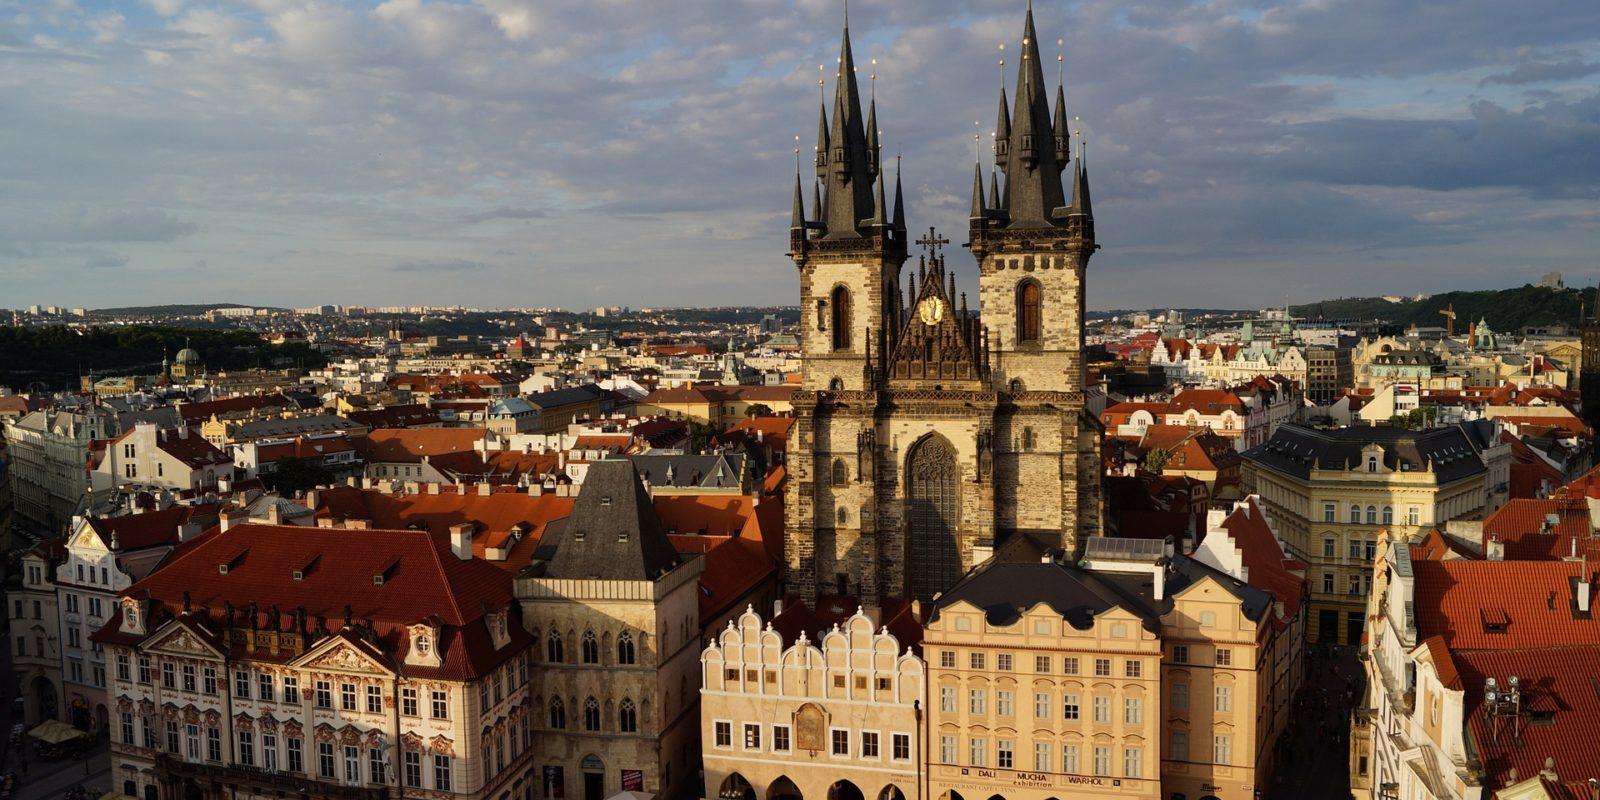 PRAGUE VENCEL SQUARE, HUNGARY